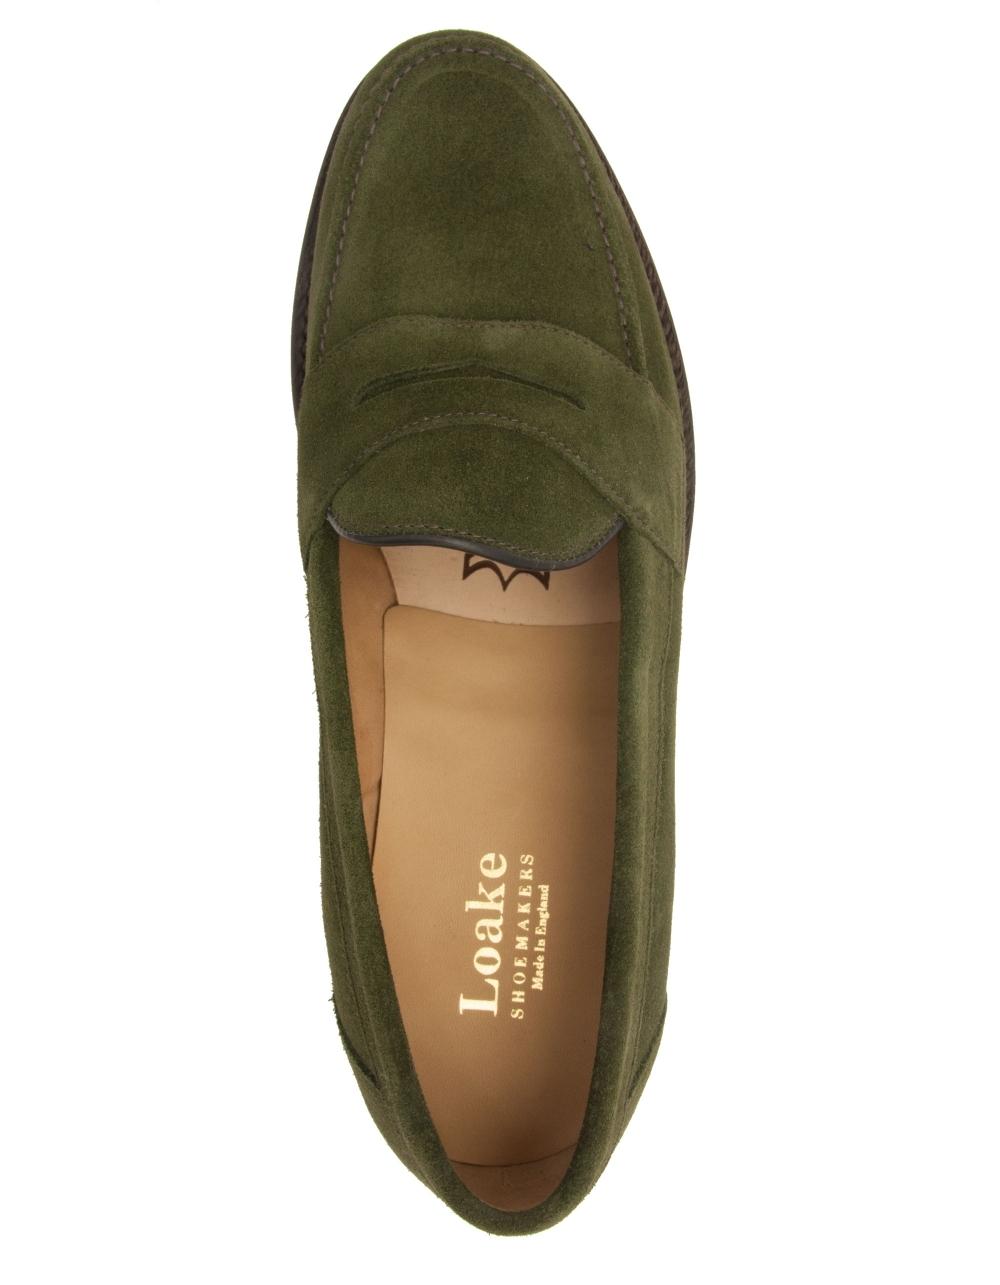 Eton Suede Saddle Loafer - Green Suede